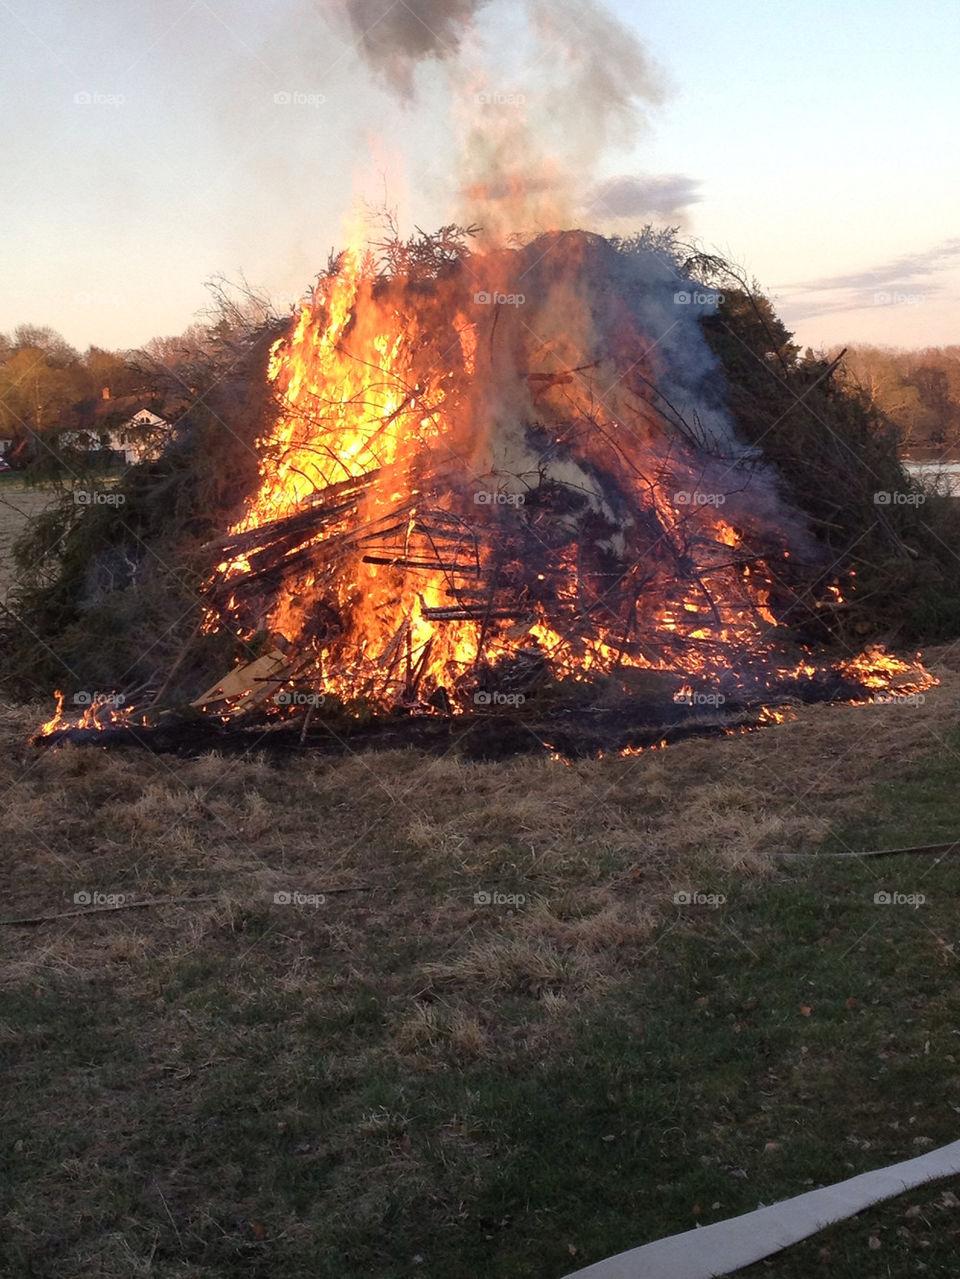 sweden grass fire shine by casperlo